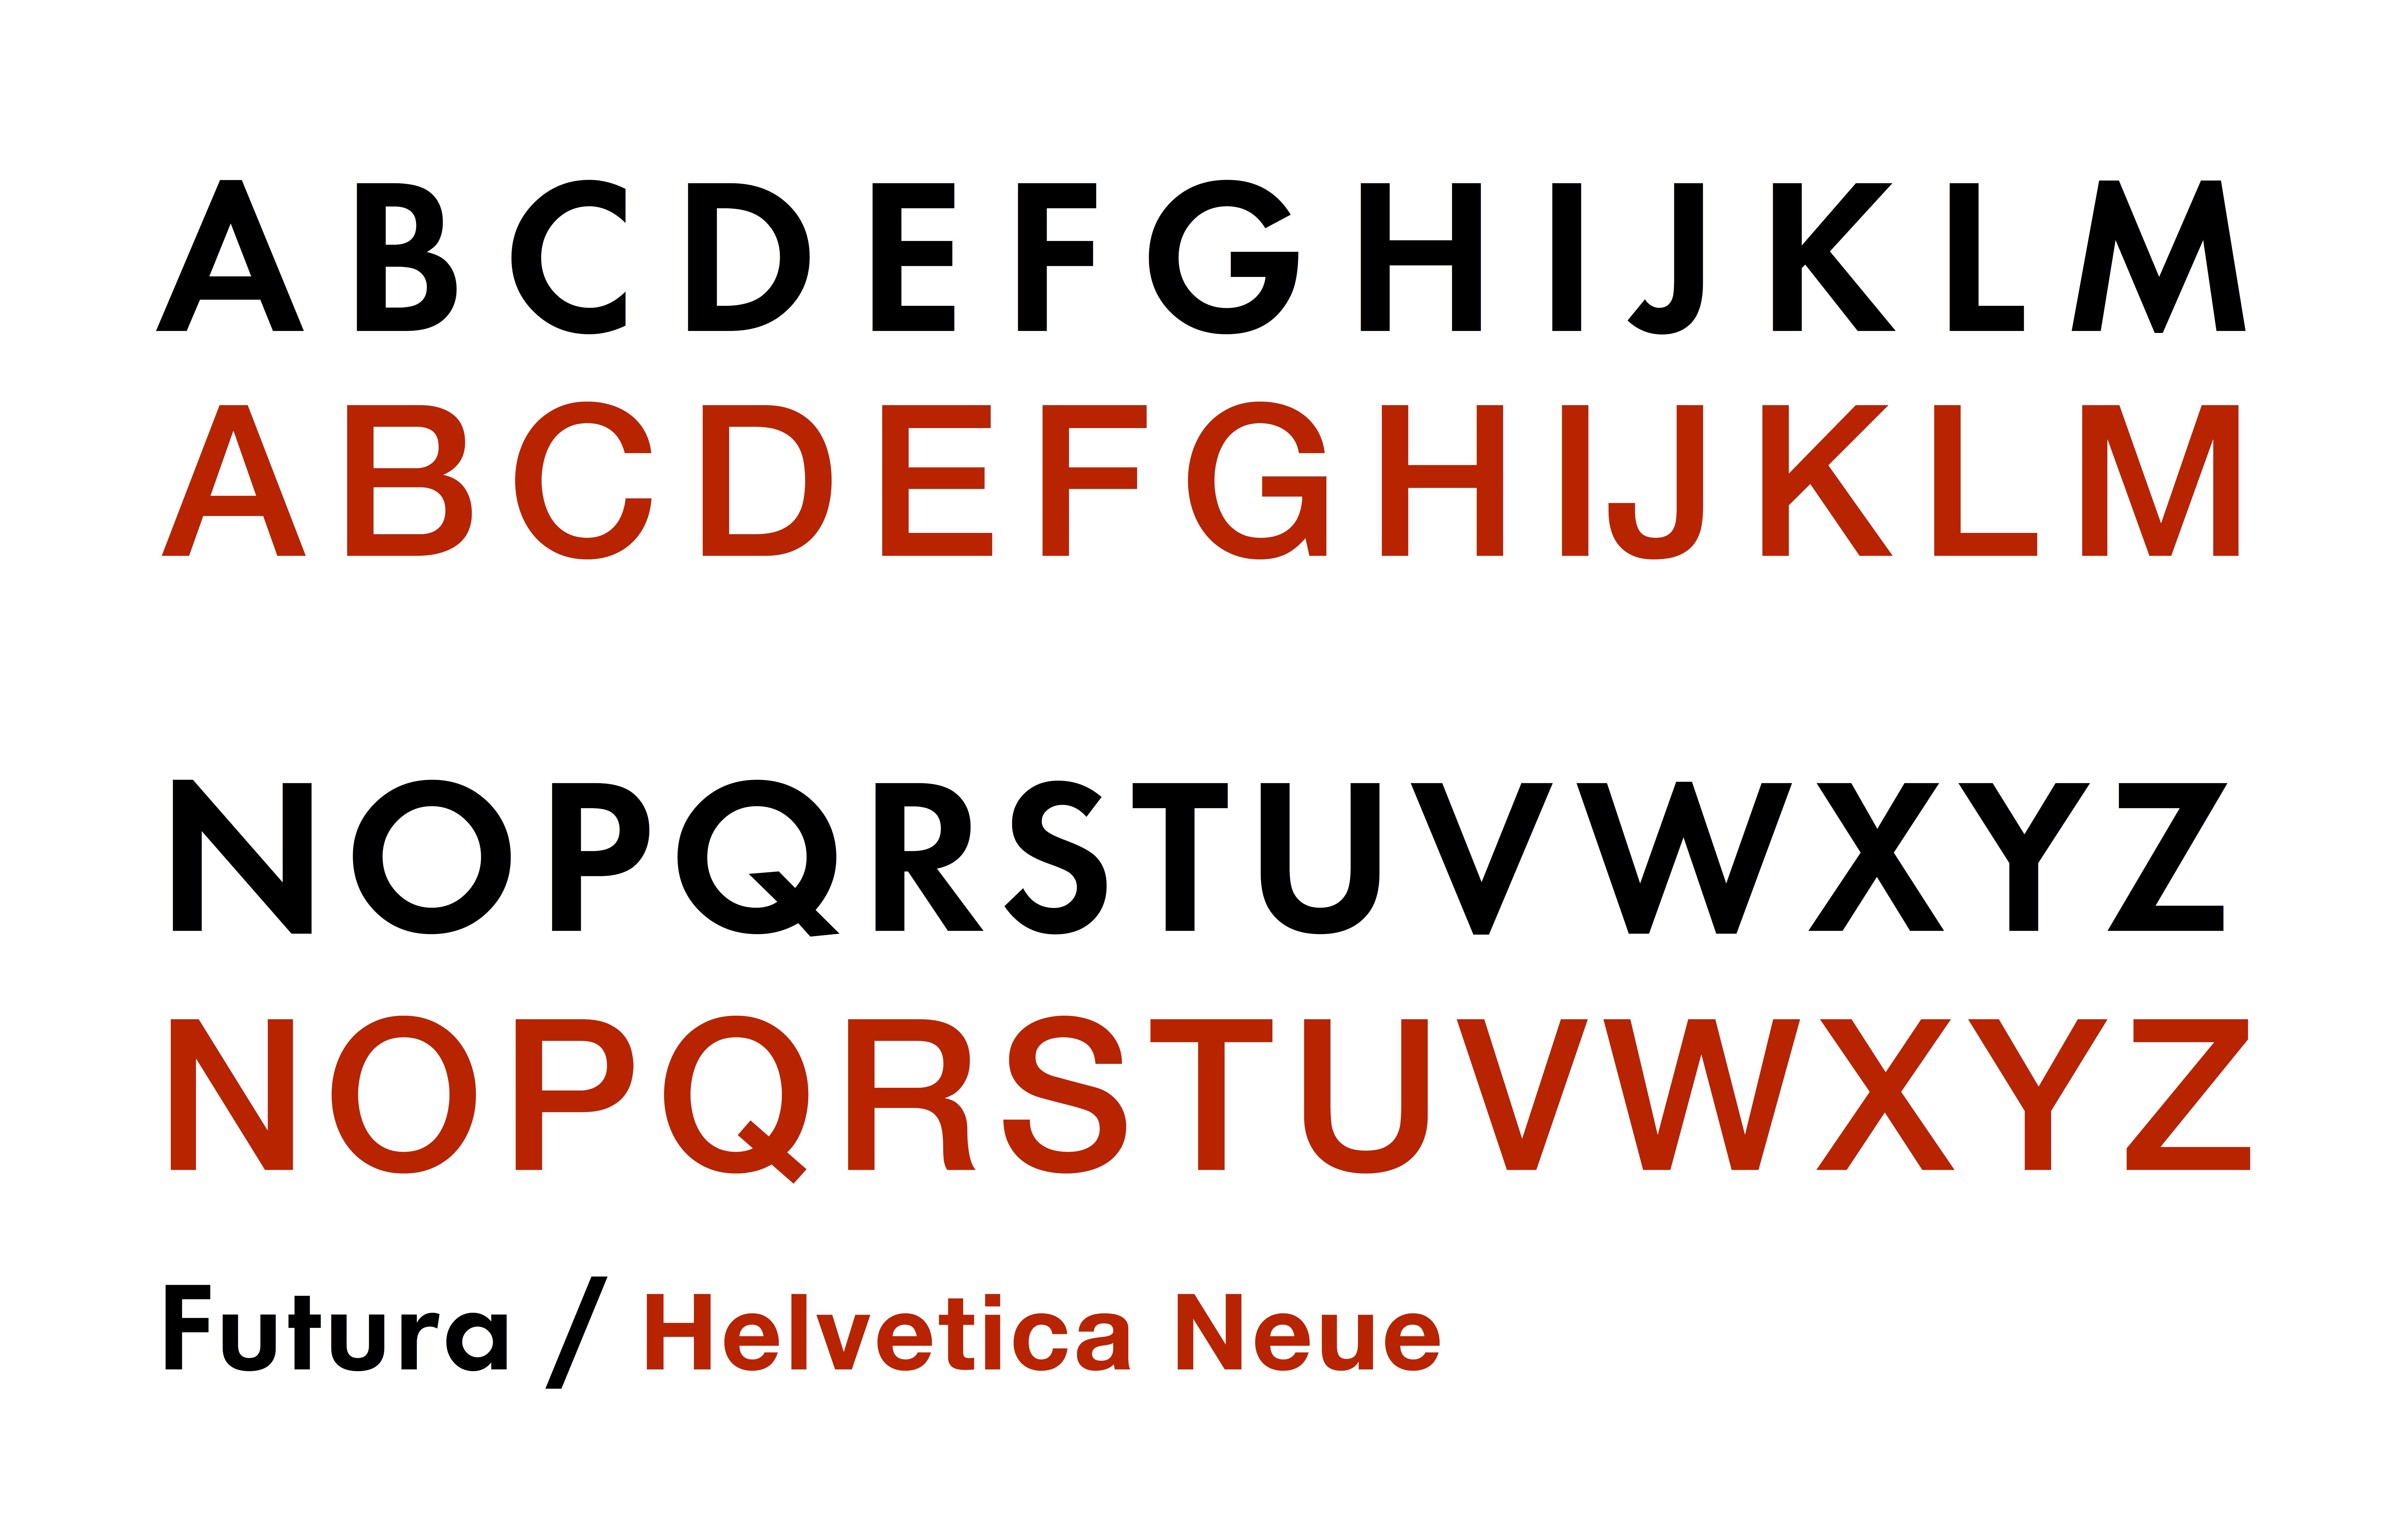 Futura Heavy Font Free Download - Futura Free